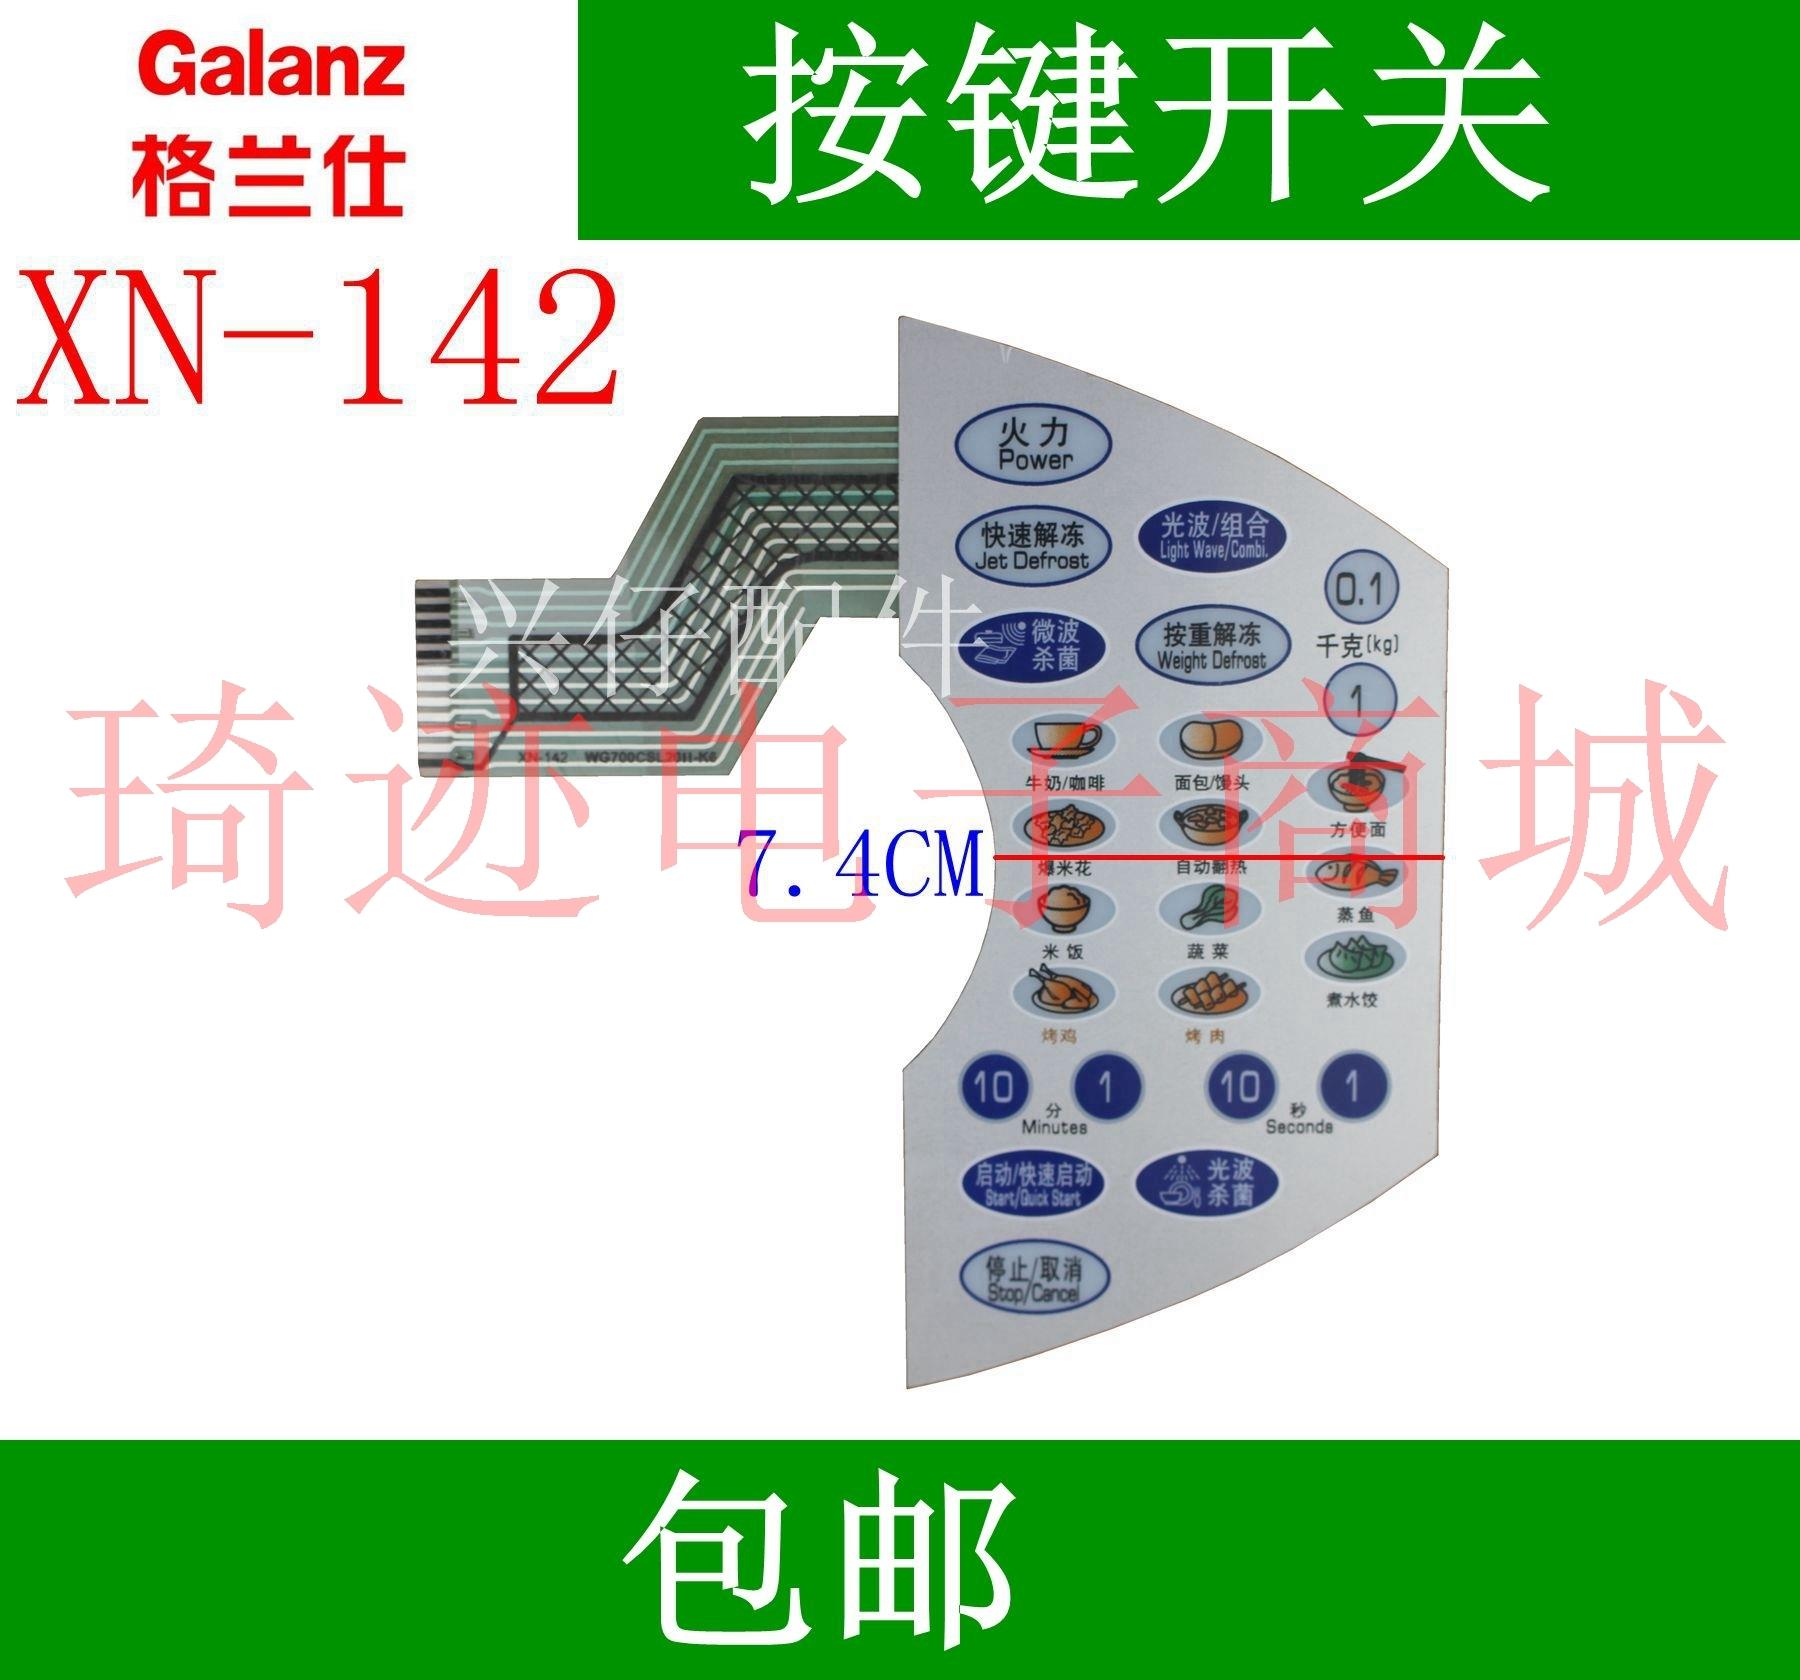 Mikrowellen glanz WG700CSL20II-K6 film - Panel - schalter schalter an wechsel